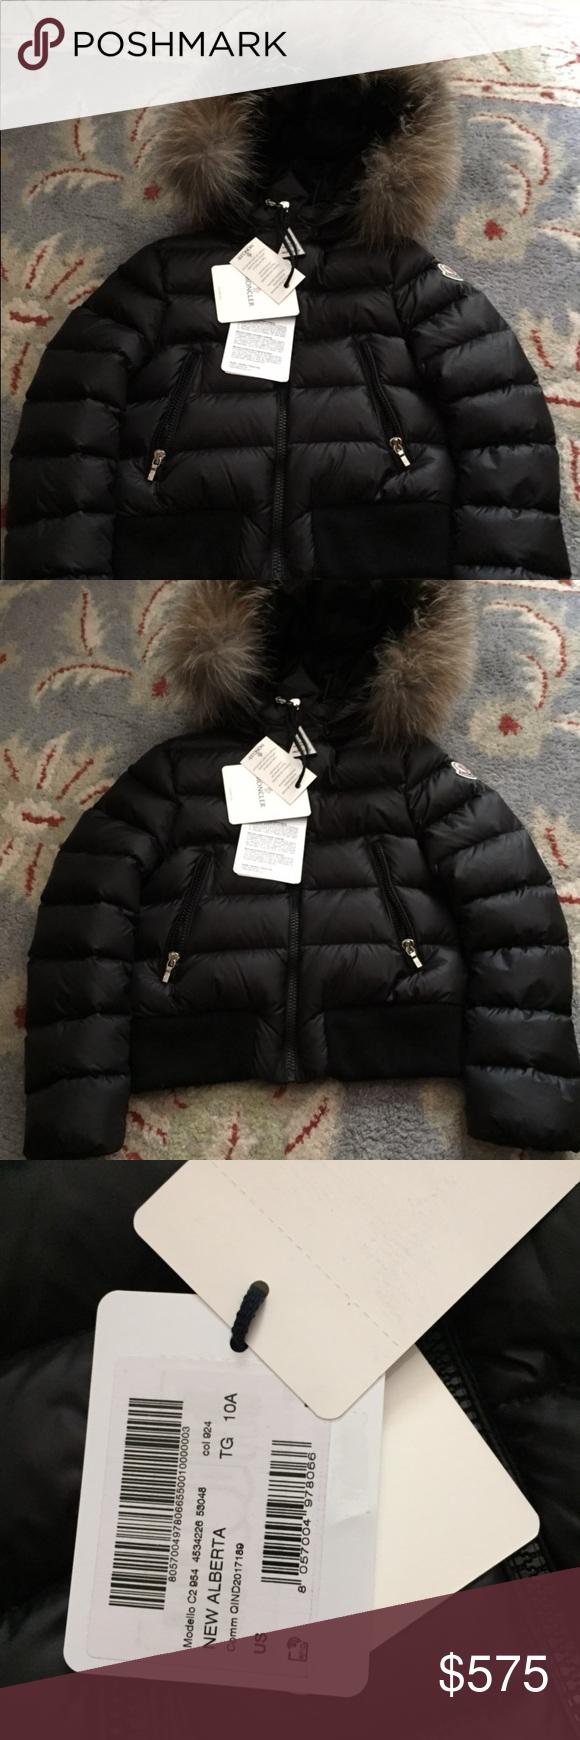 Moncler KIDS New Alberta Down Coat 8 845 furhood NWT